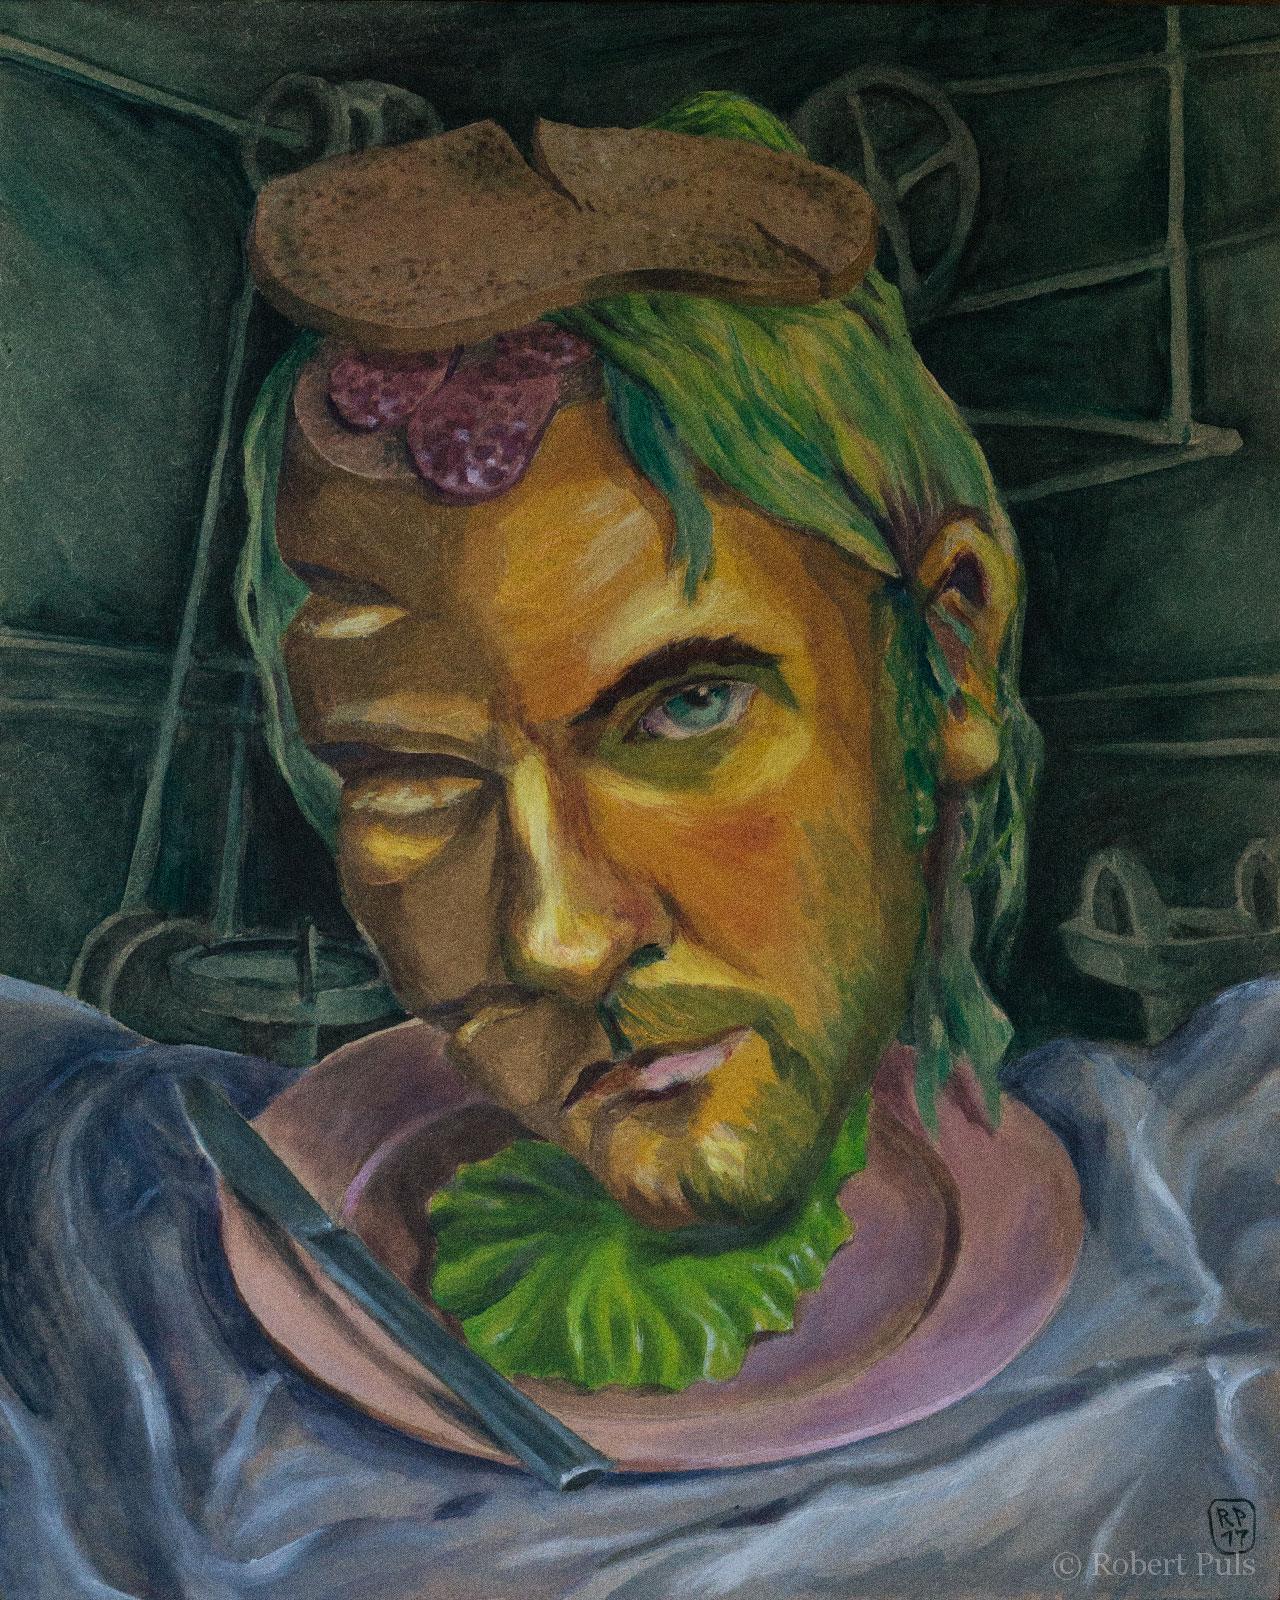 Brotschaften angerichtet Malerei Acryl Robert Puls